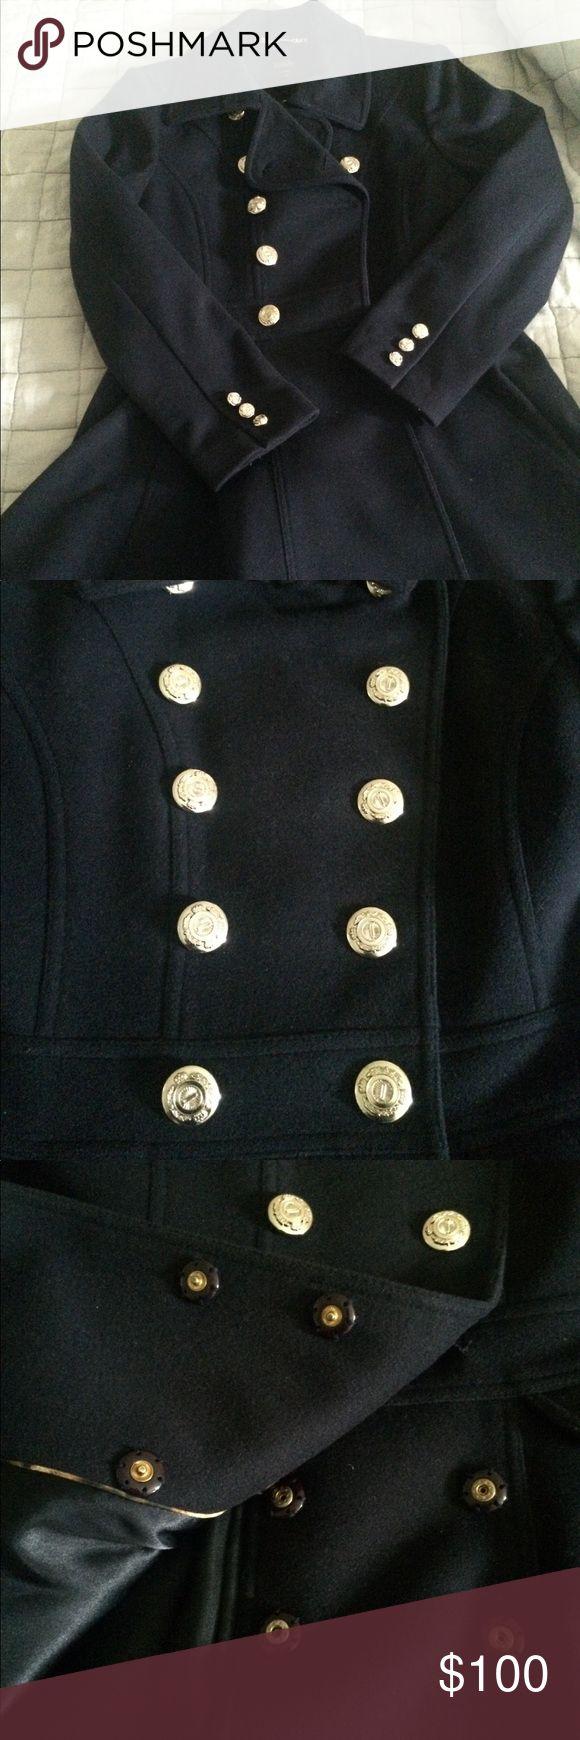 Selling this Navy Princess Peacoat, Laundry by Shelli Segal on Poshmark! My username is: leighnico. #shopmycloset #poshmark #fashion #shopping #style #forsale #shelli segal #Jackets & Blazers